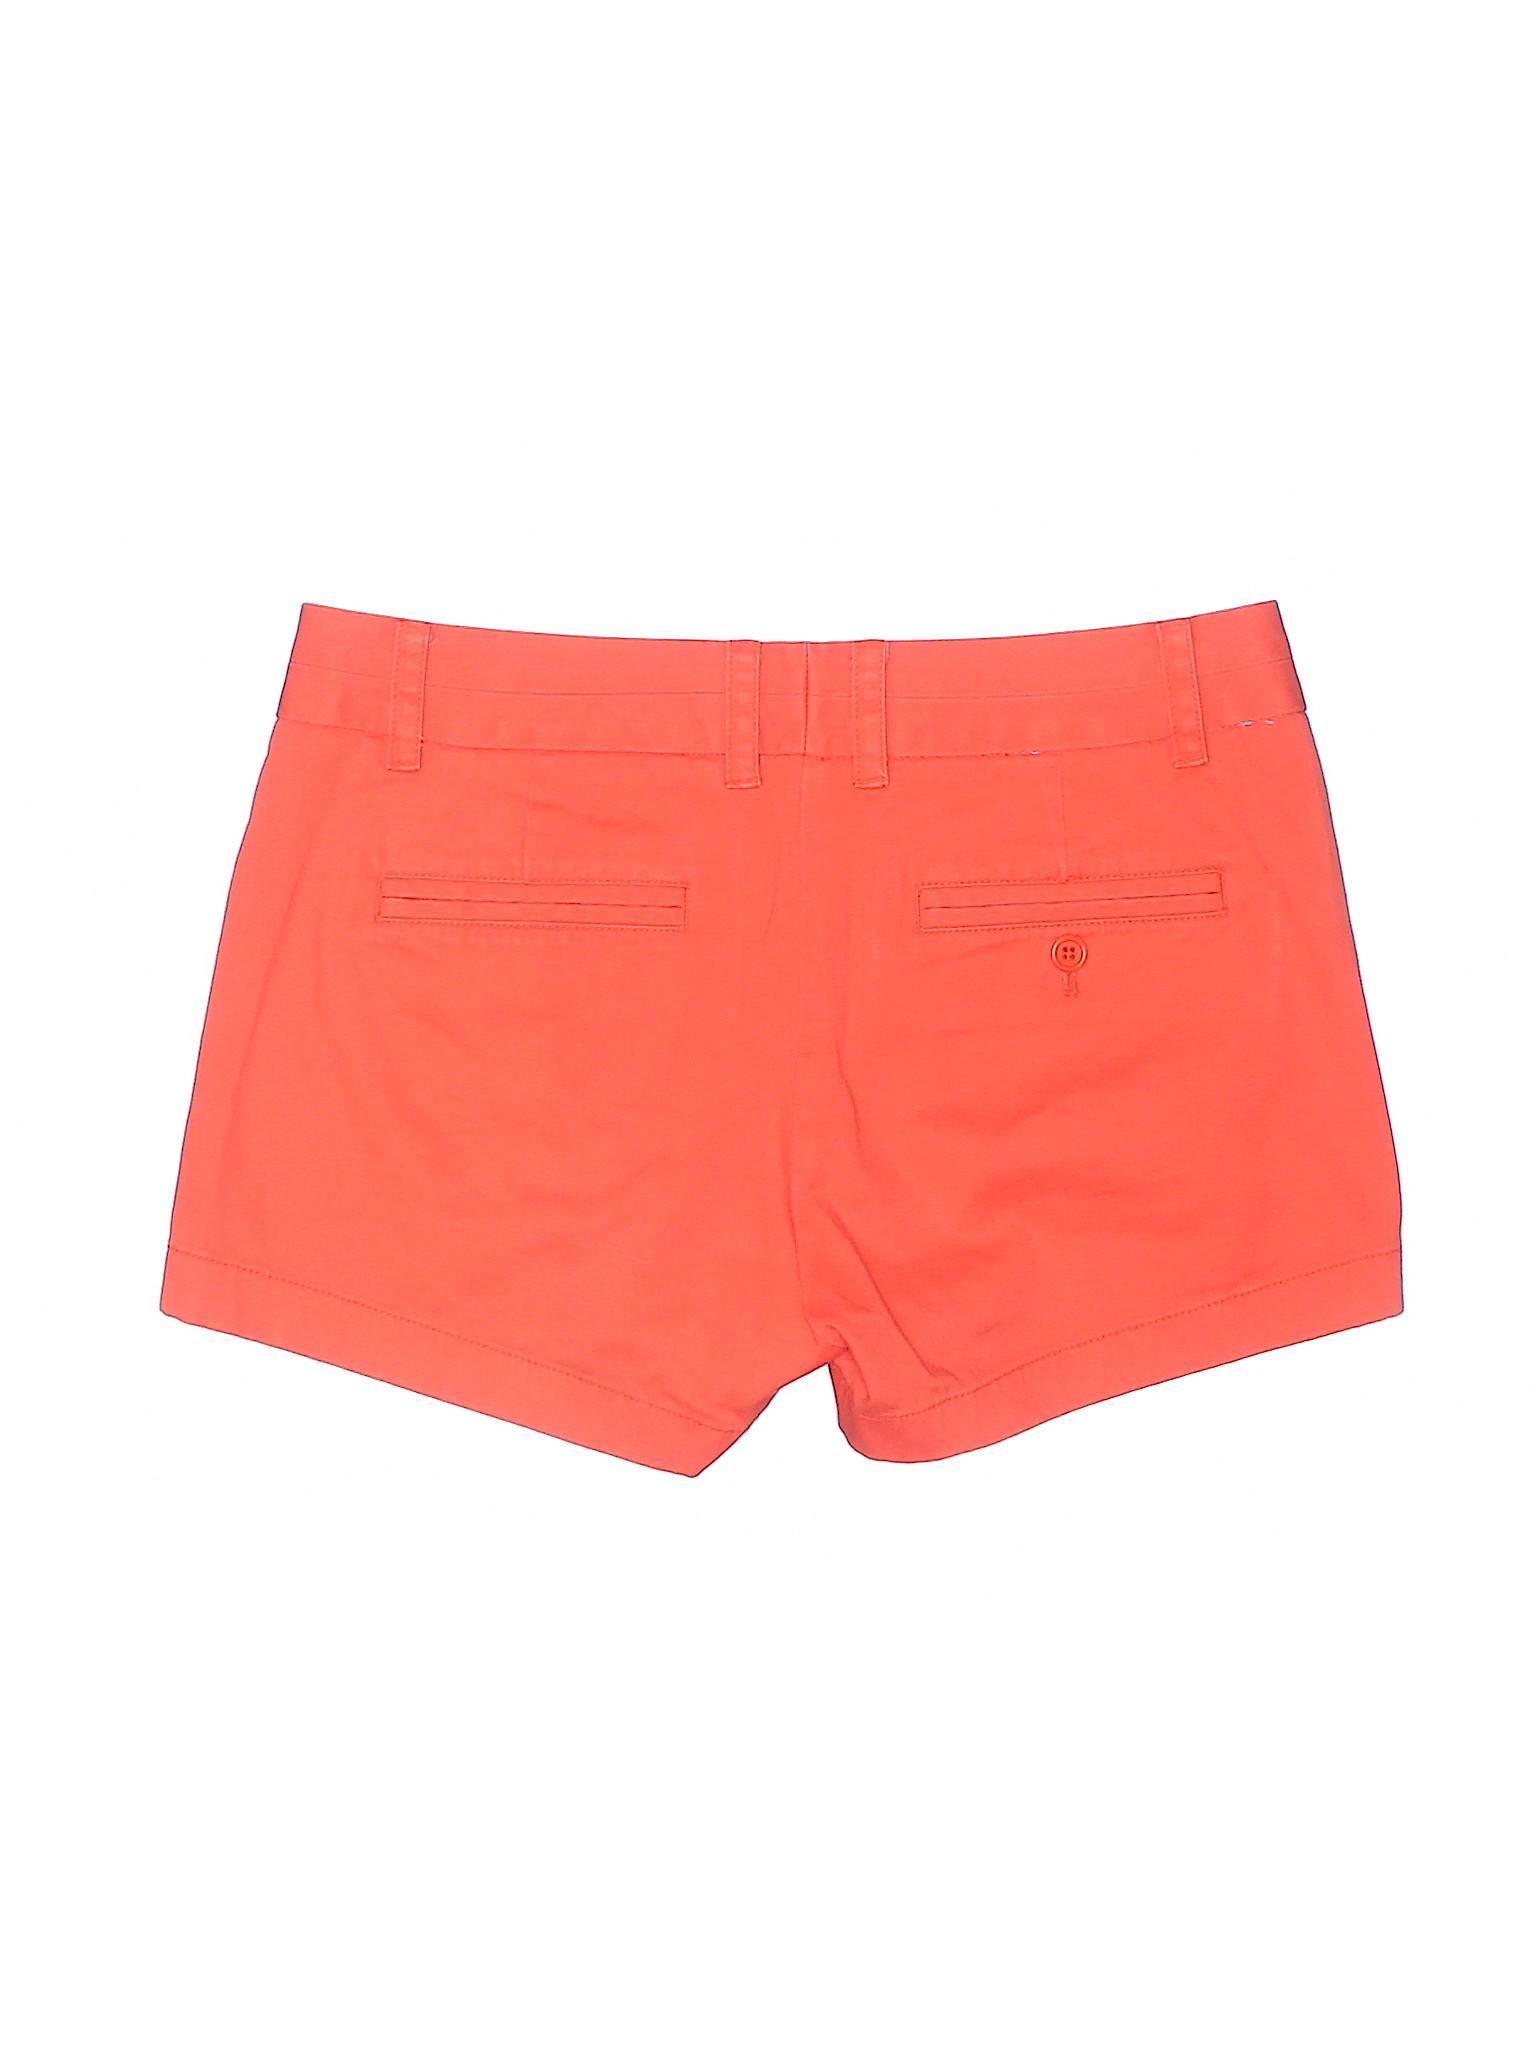 Shorts winter Khaki Crew J Leisure x8O14qwAn1